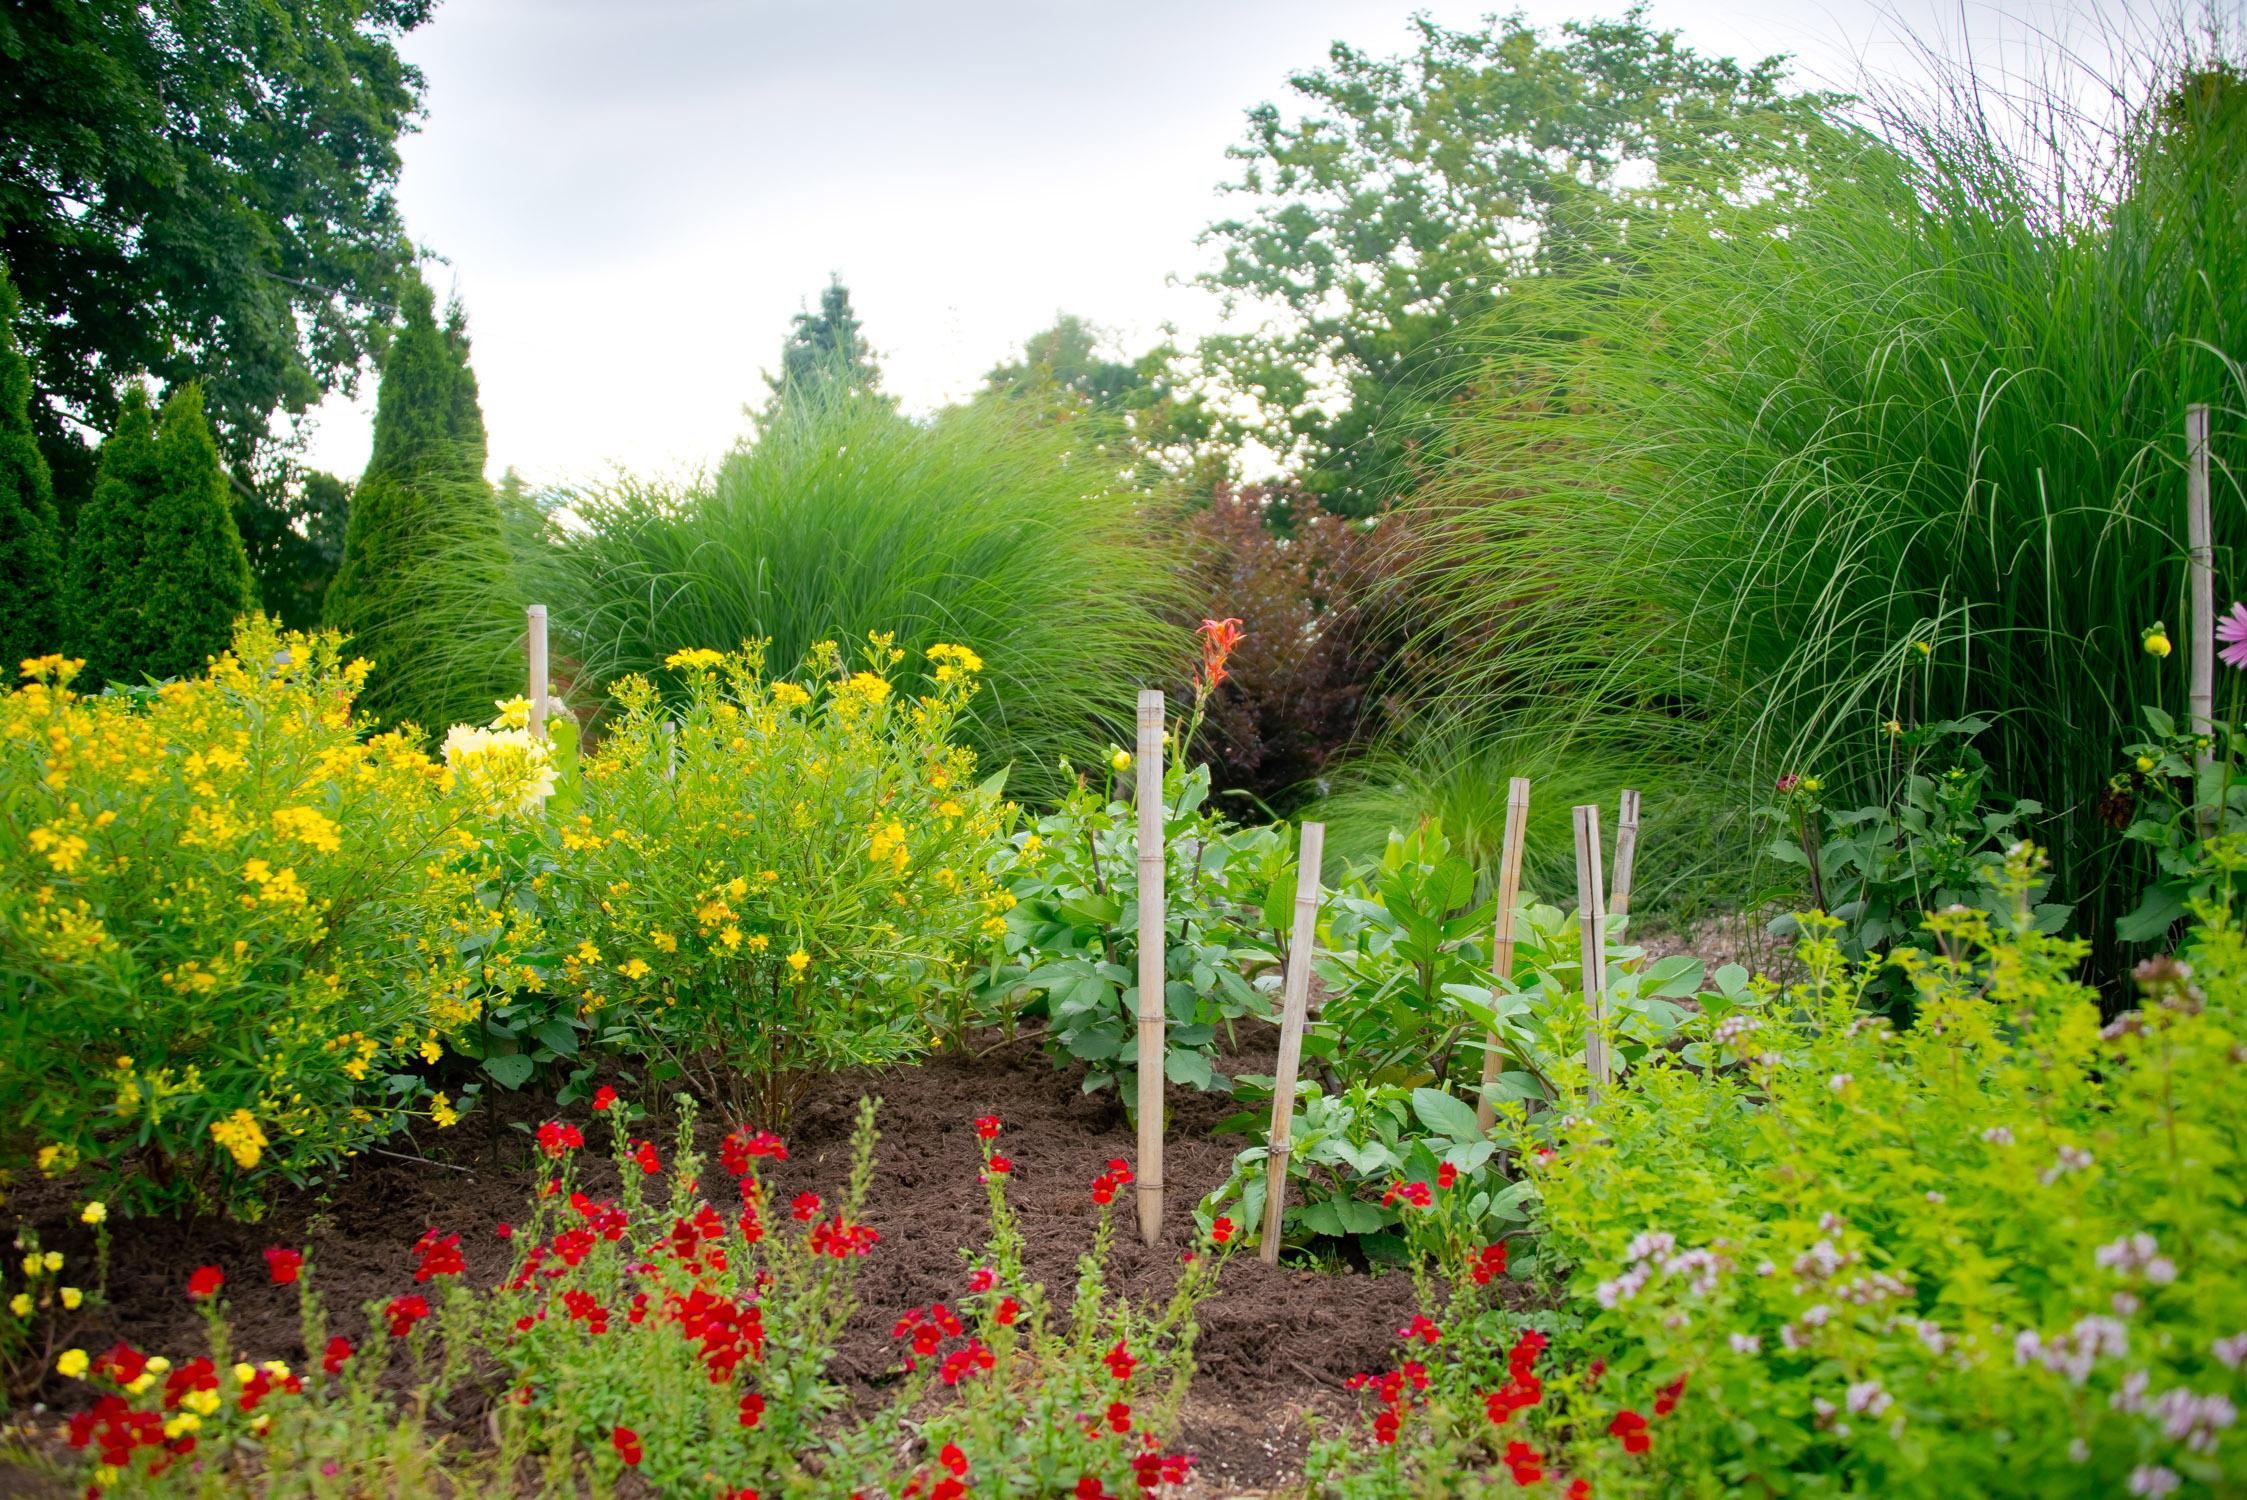 GardenEvent_Photos_Tiffany_009.jpg